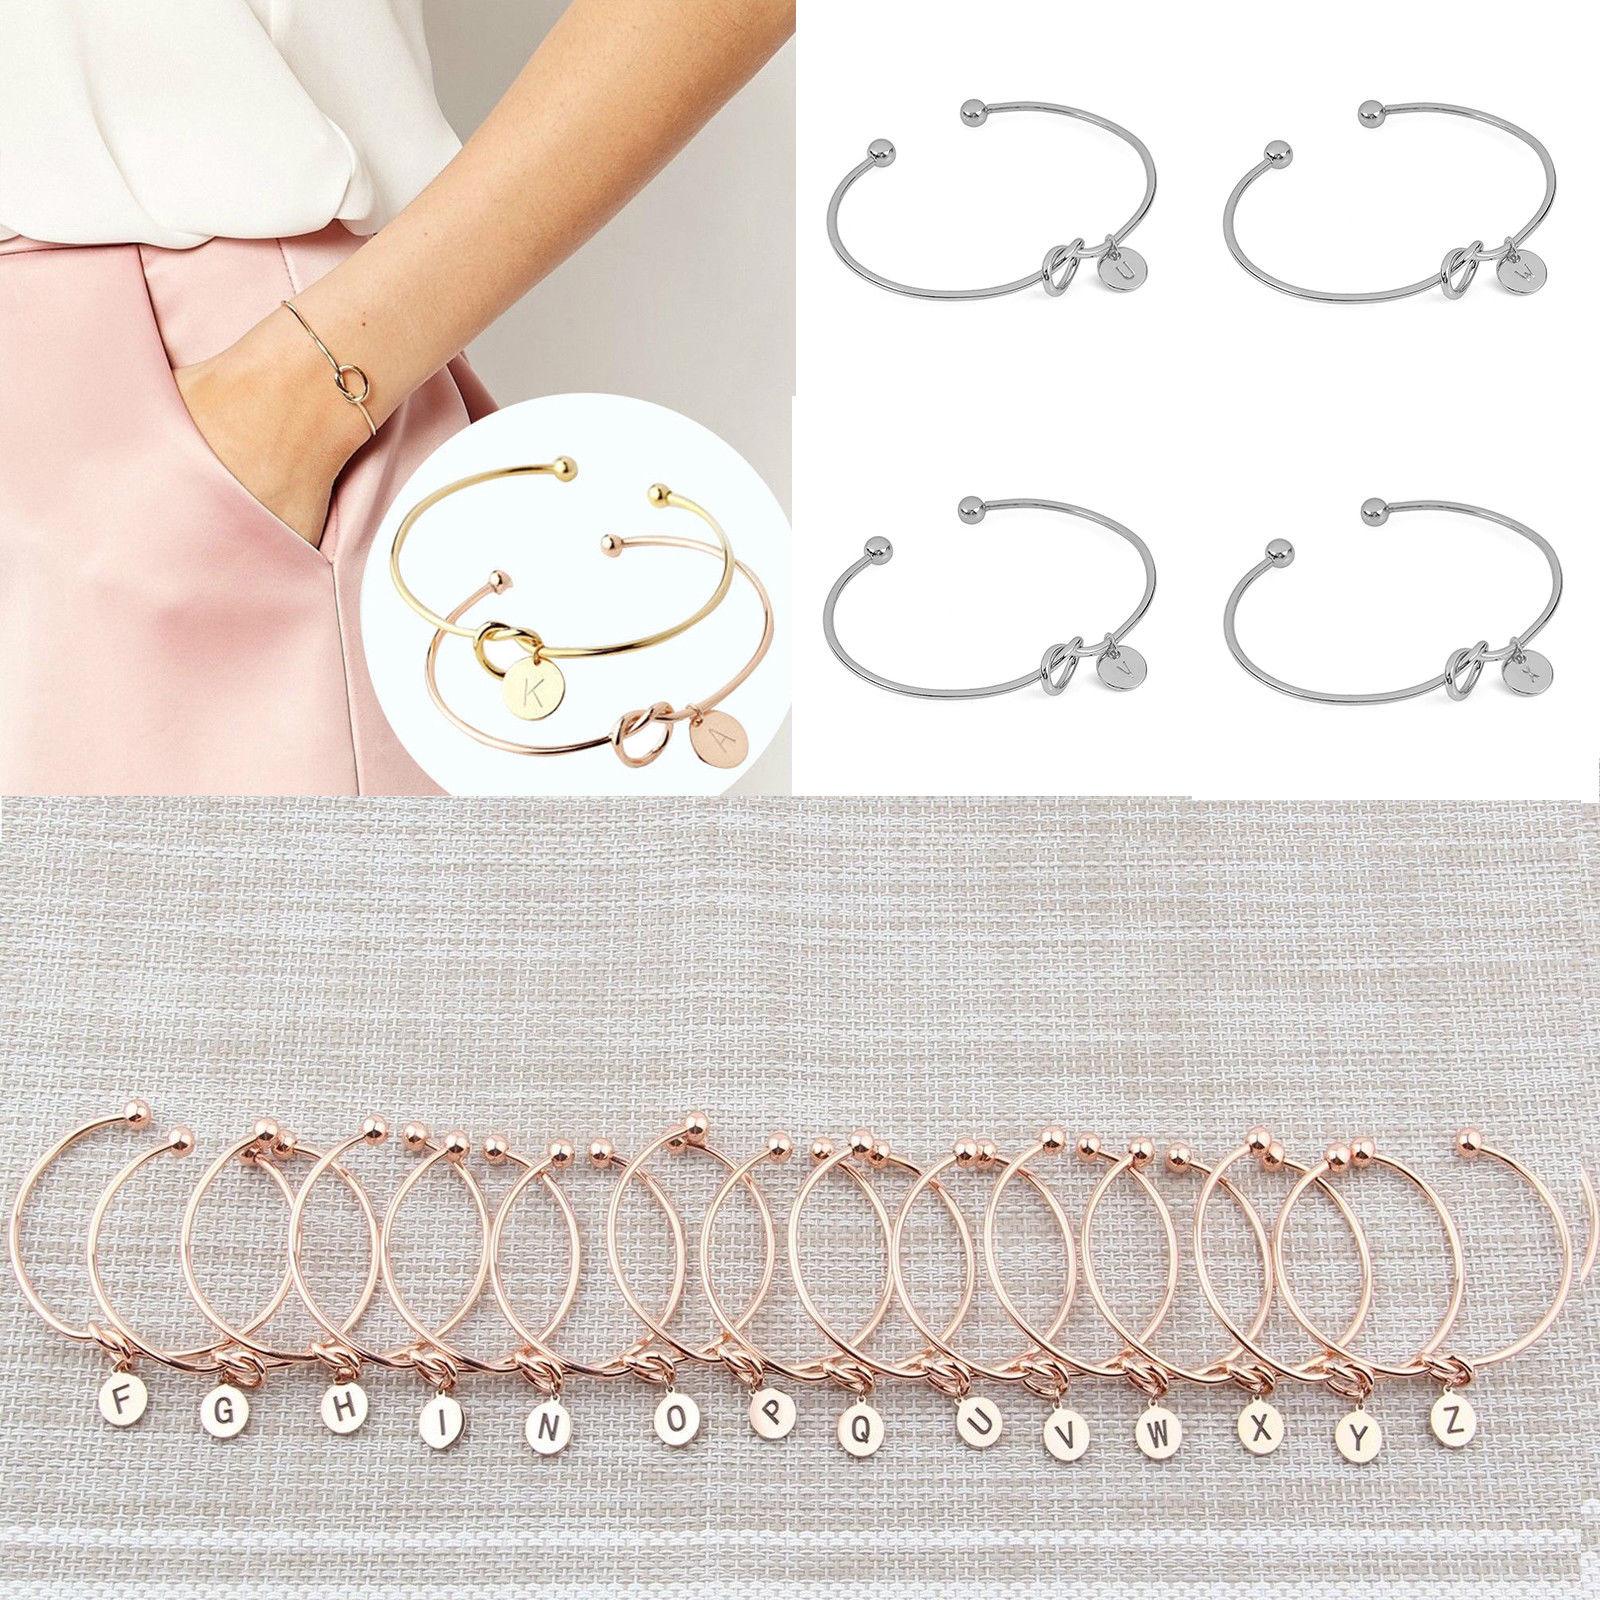 Personalized Initial Knot Bracelet Monogram Bracelet Bridesmaid Letter Bracelet